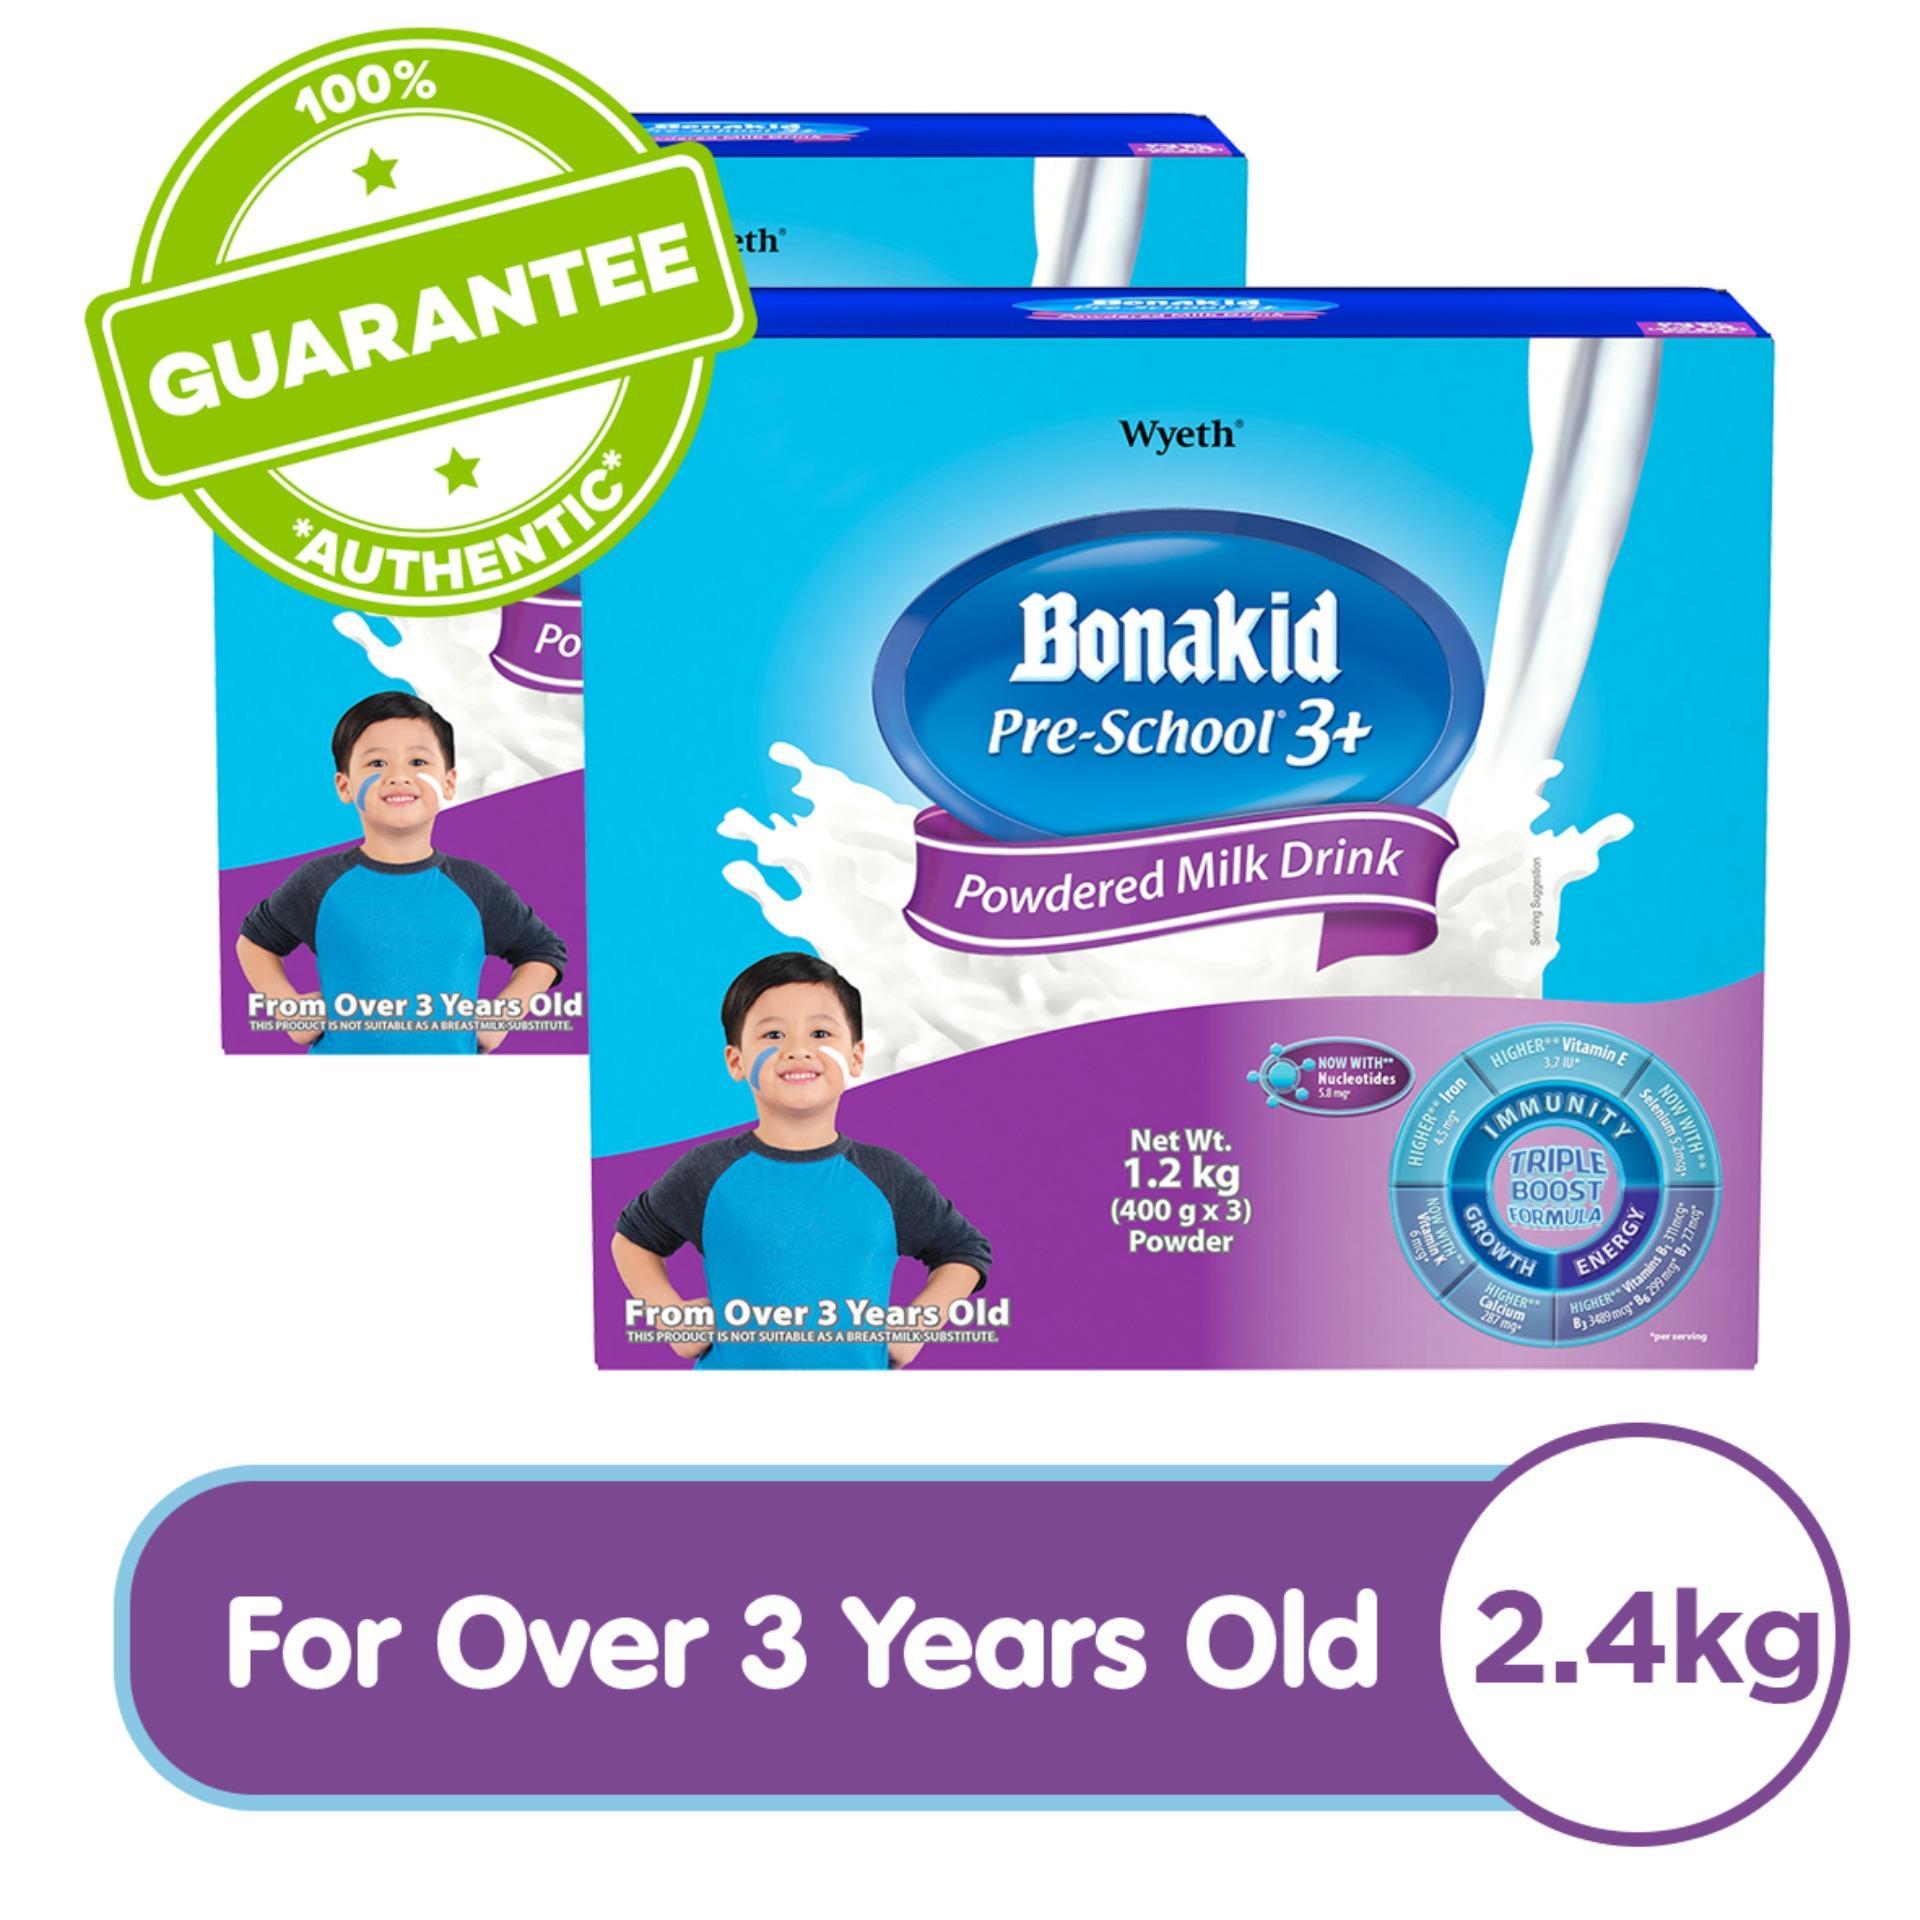 Wyeth® BONAKID PRE-SCHOOL® 3+ Powdered Milk Drink for Children Over 3